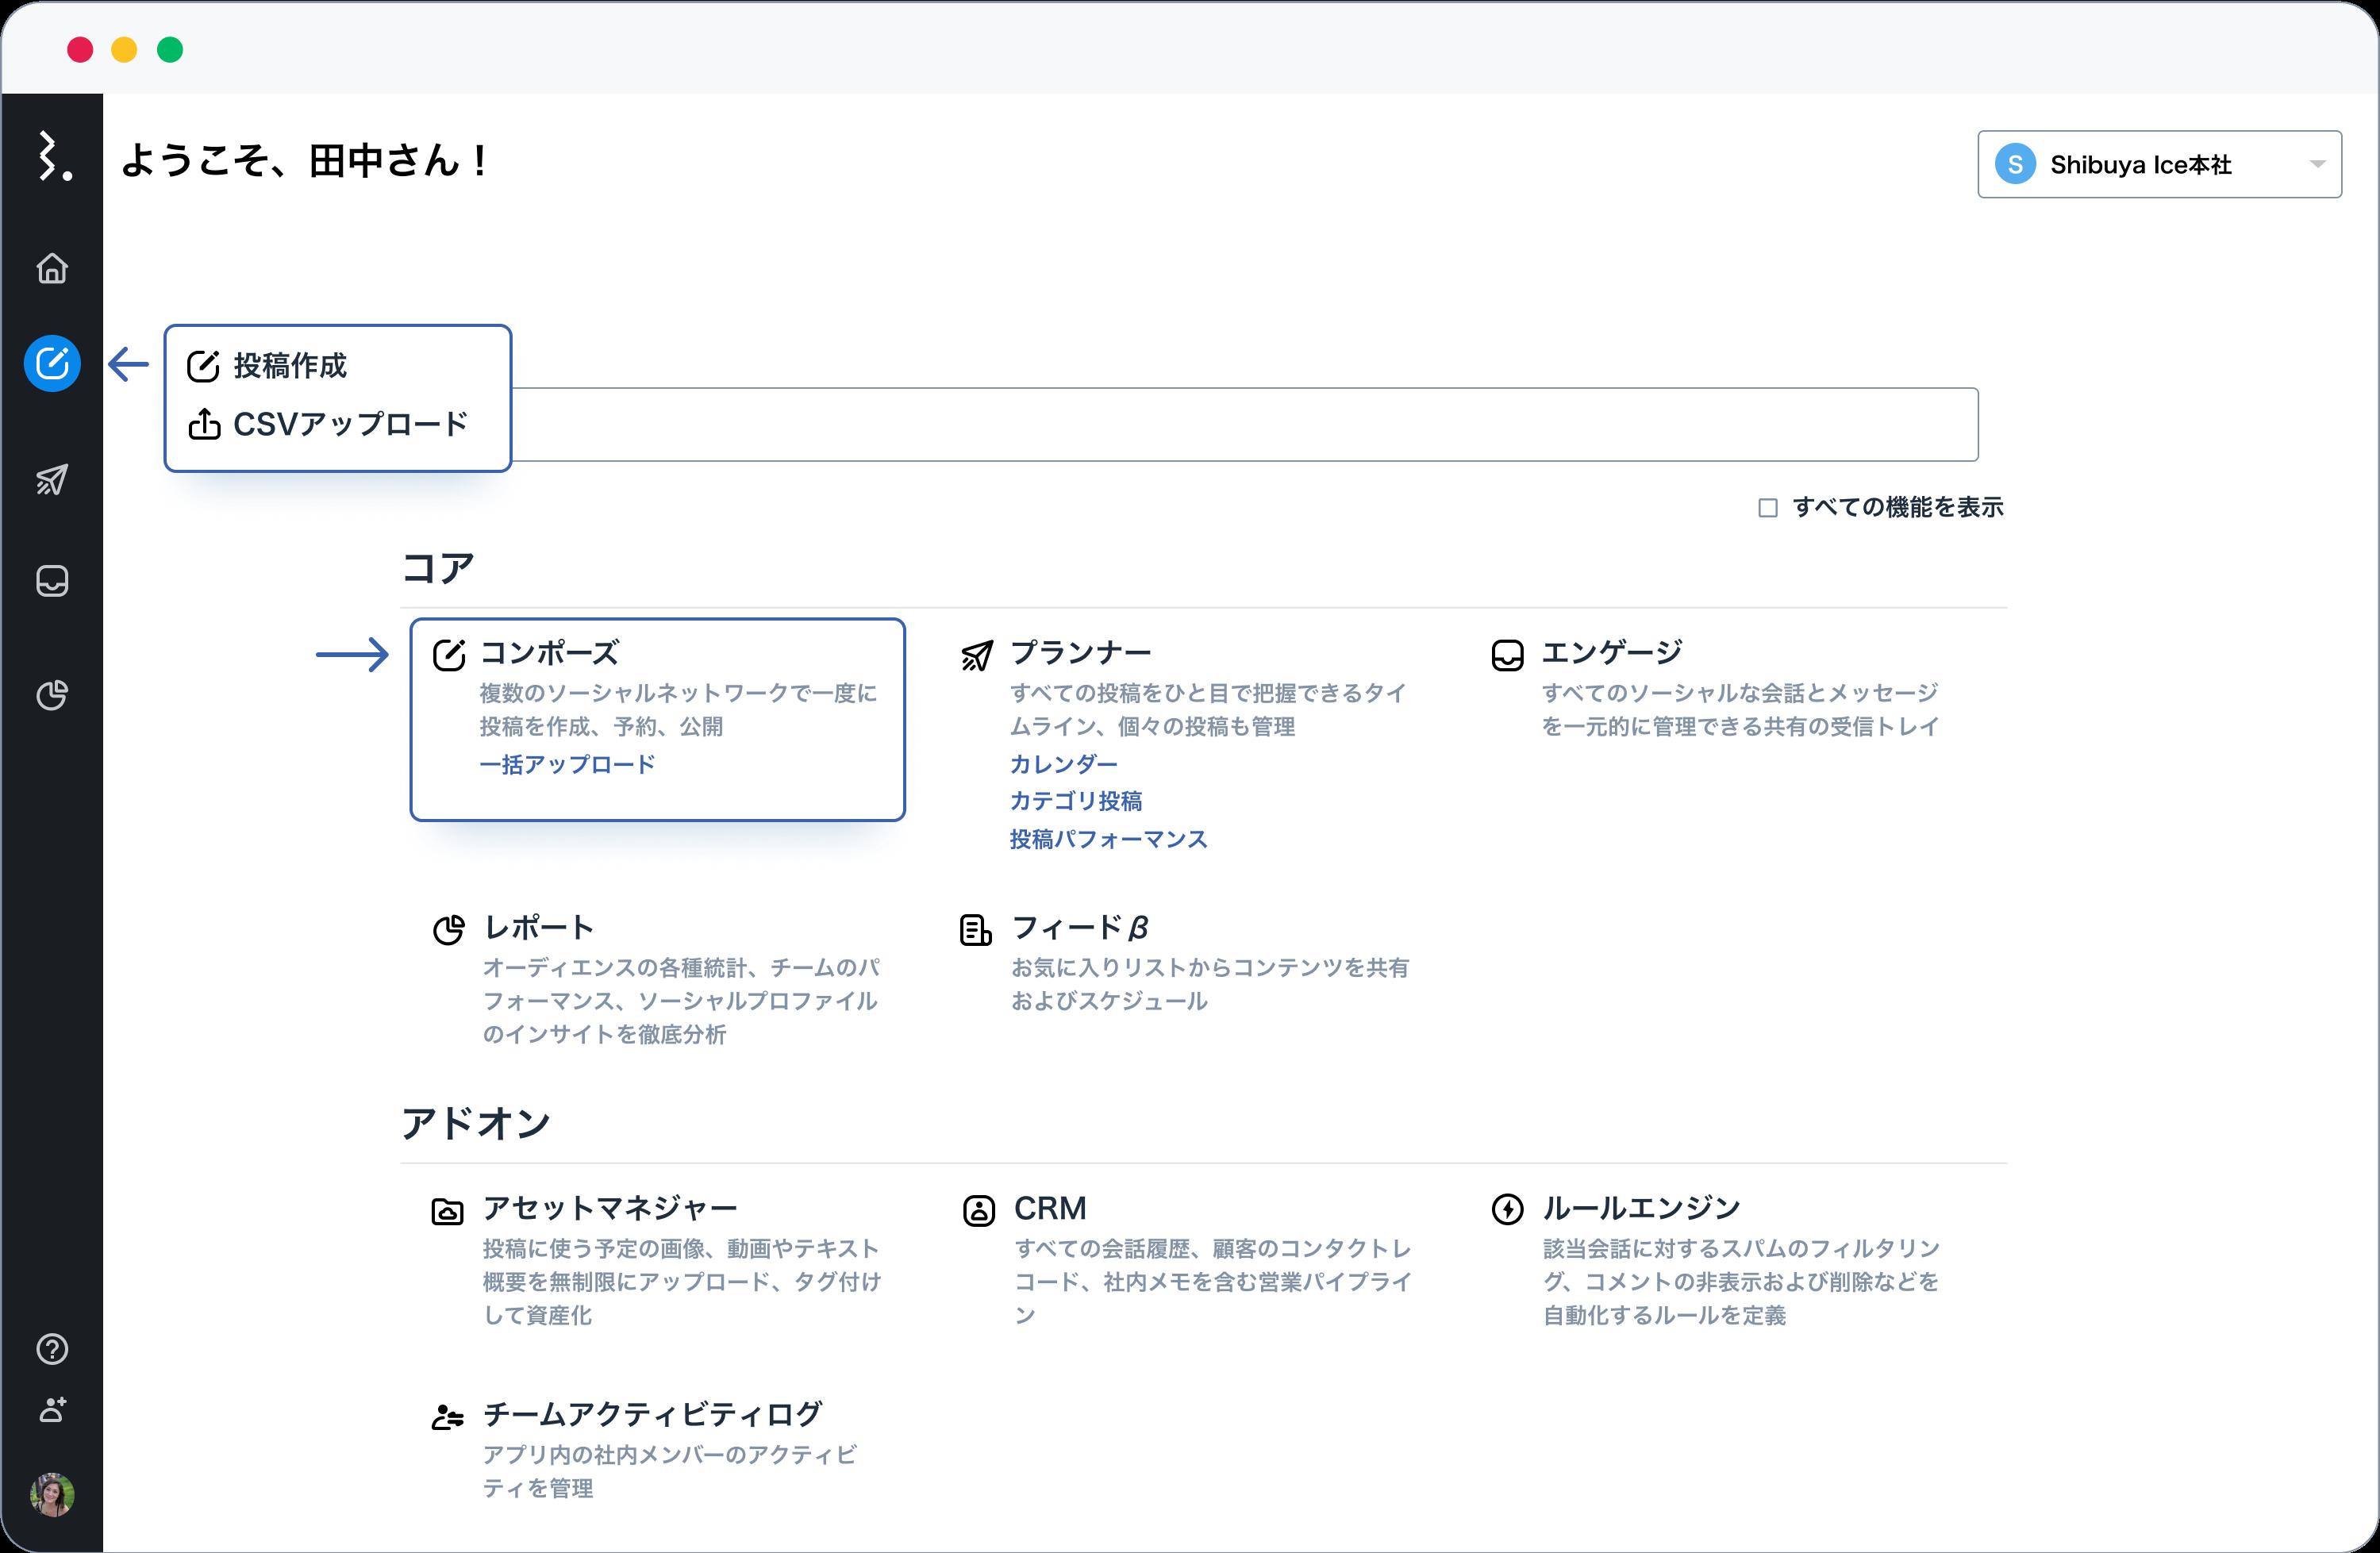 StatusbrewのSNS管理ツール